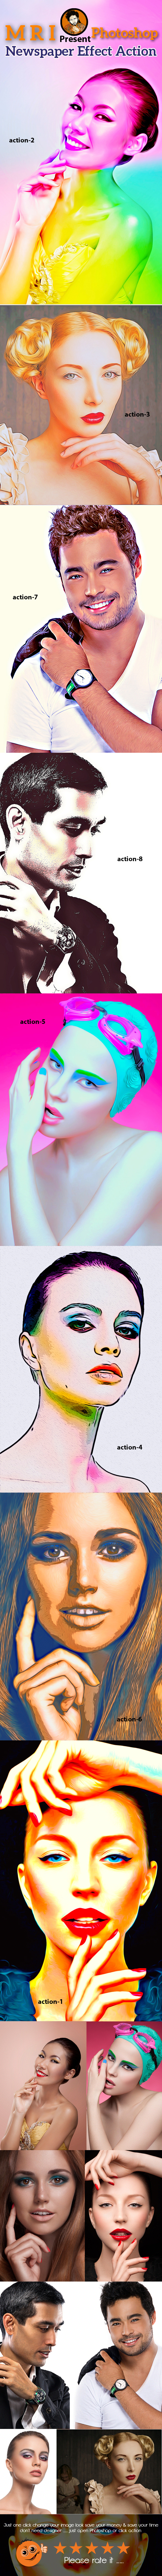 Digital Art VL-2 - Actions Photoshop